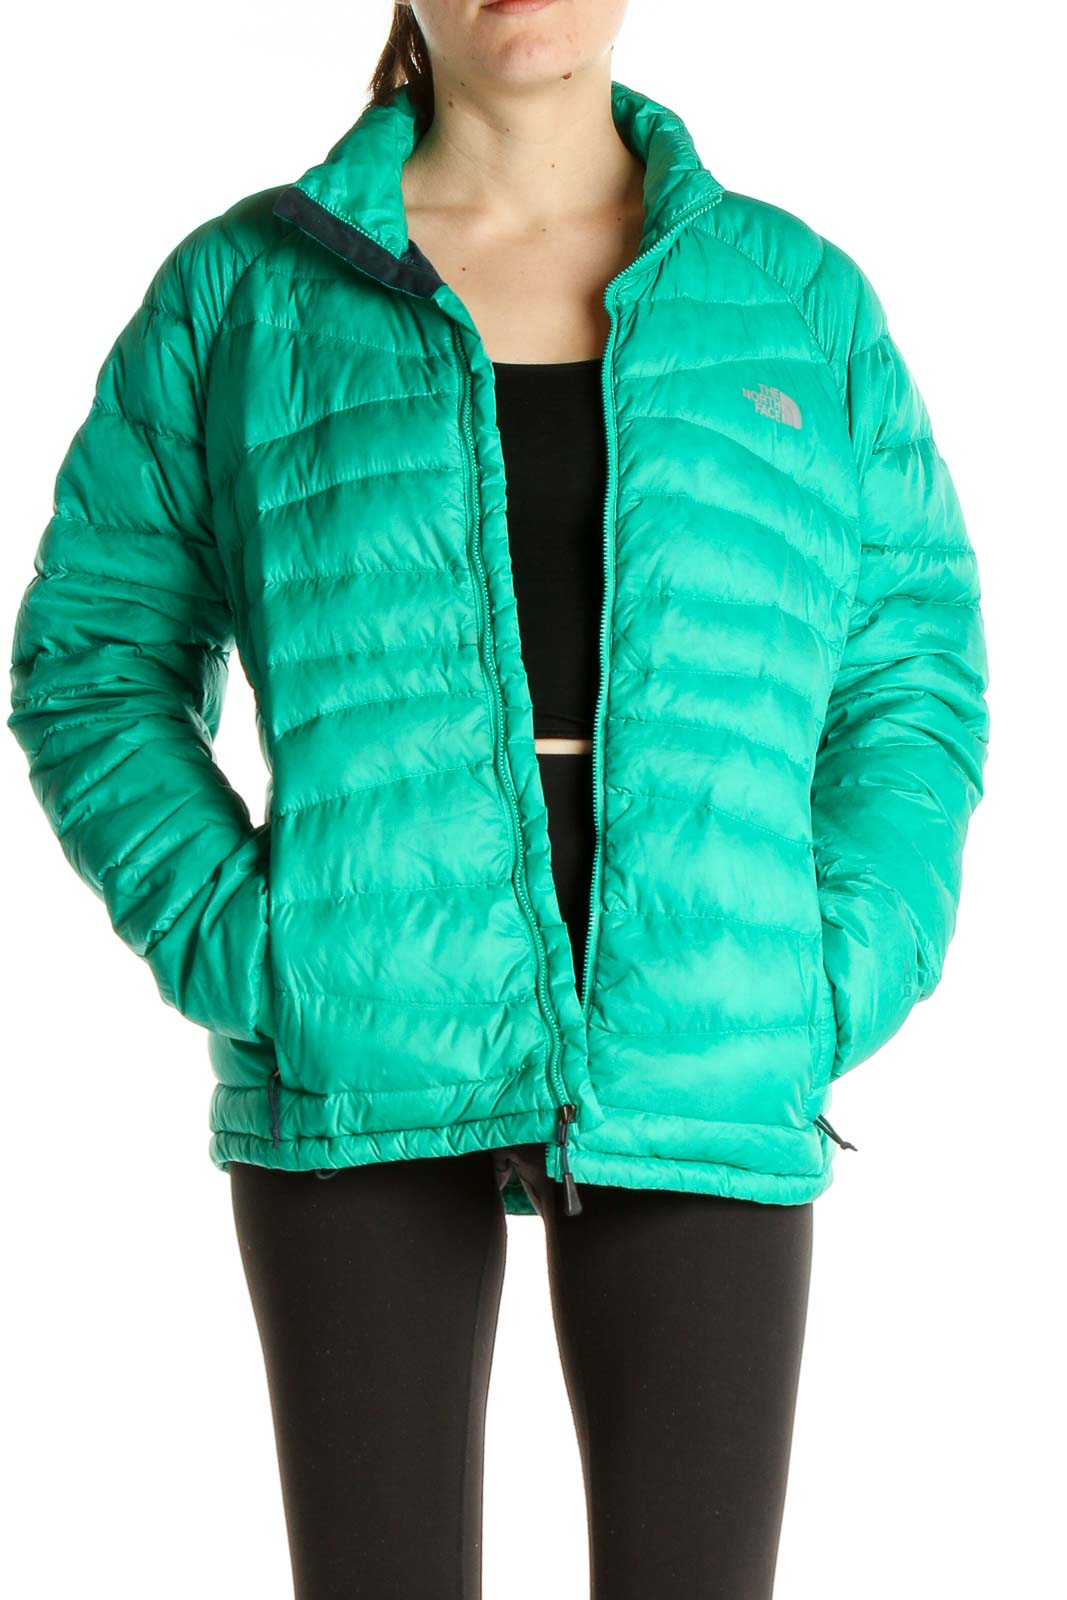 Green Puffer Jacket Front